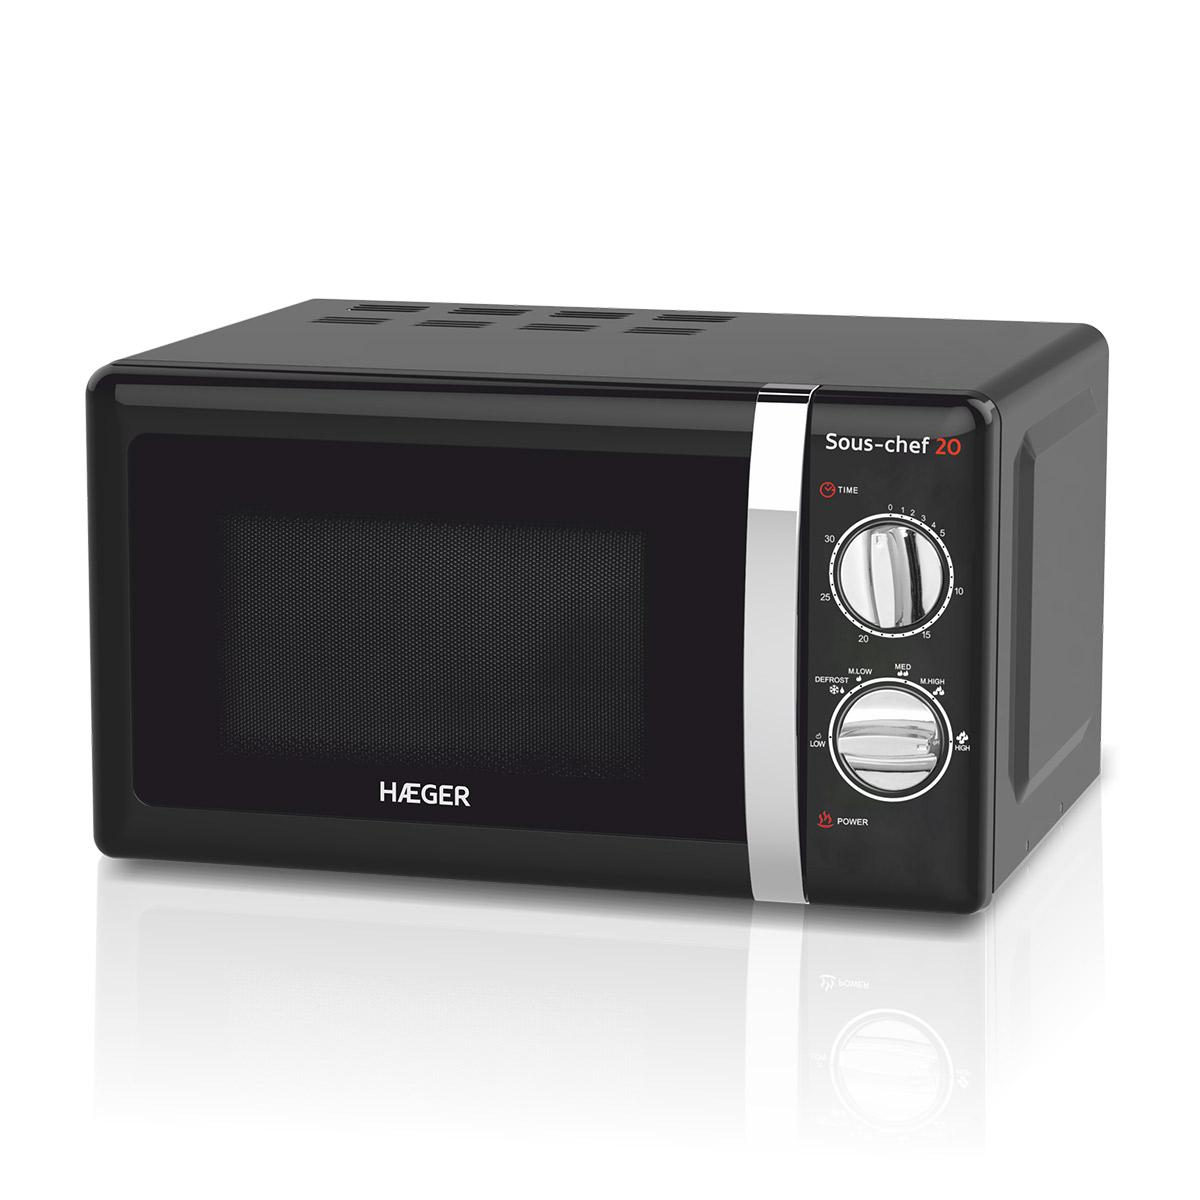 micro-ondas-com-6-niveis-haeger-sous-chef-20-black-700-w-20-lt-cor-preta-img-002